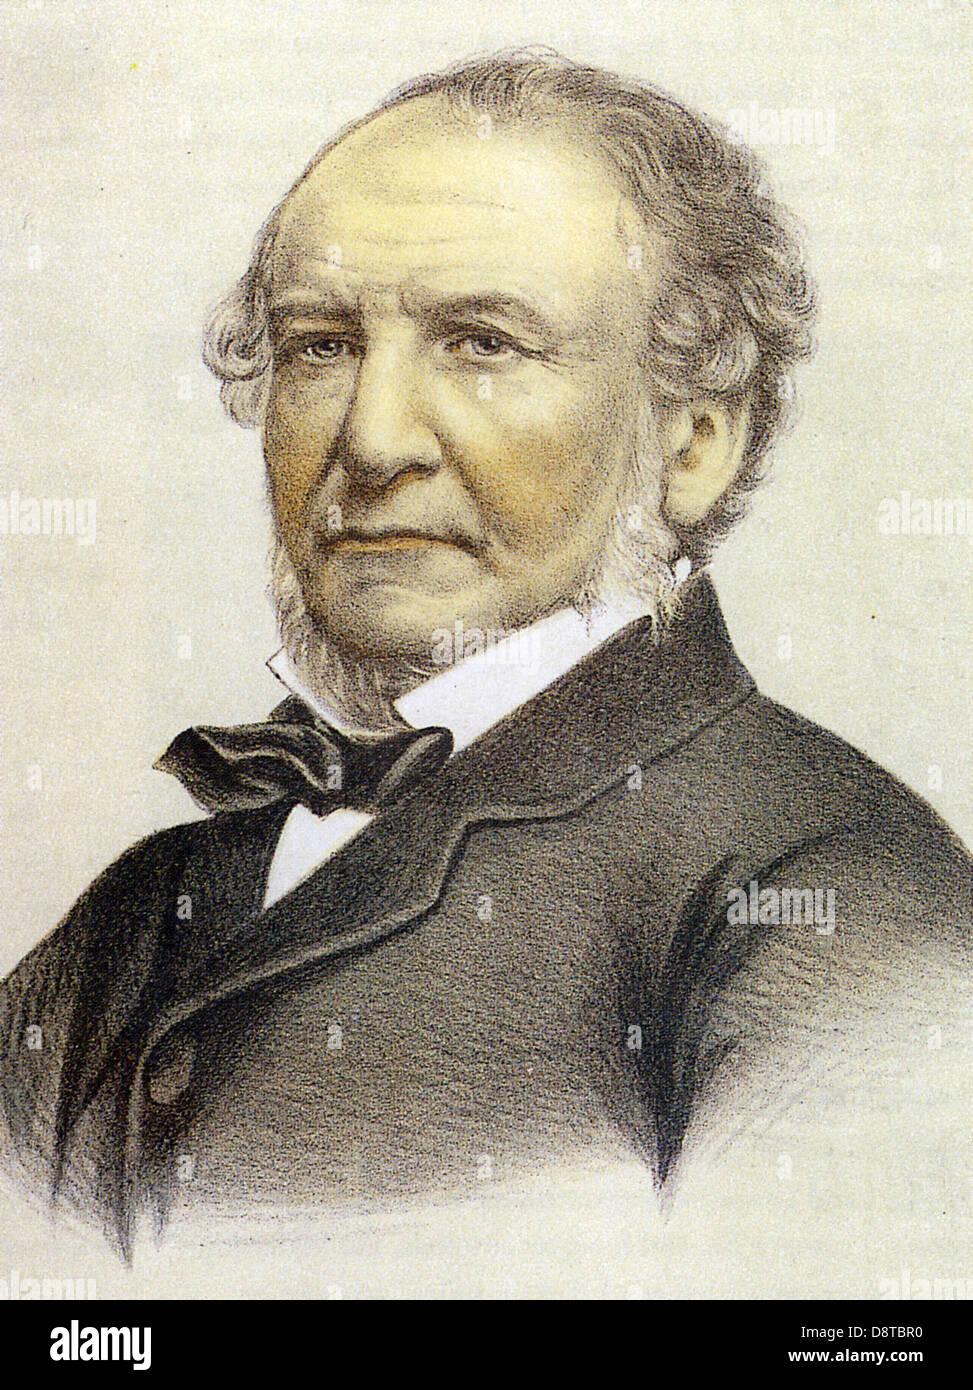 WILLIAM GLADSTONE  (1809- 1898) British Liberal statesman - Stock Image